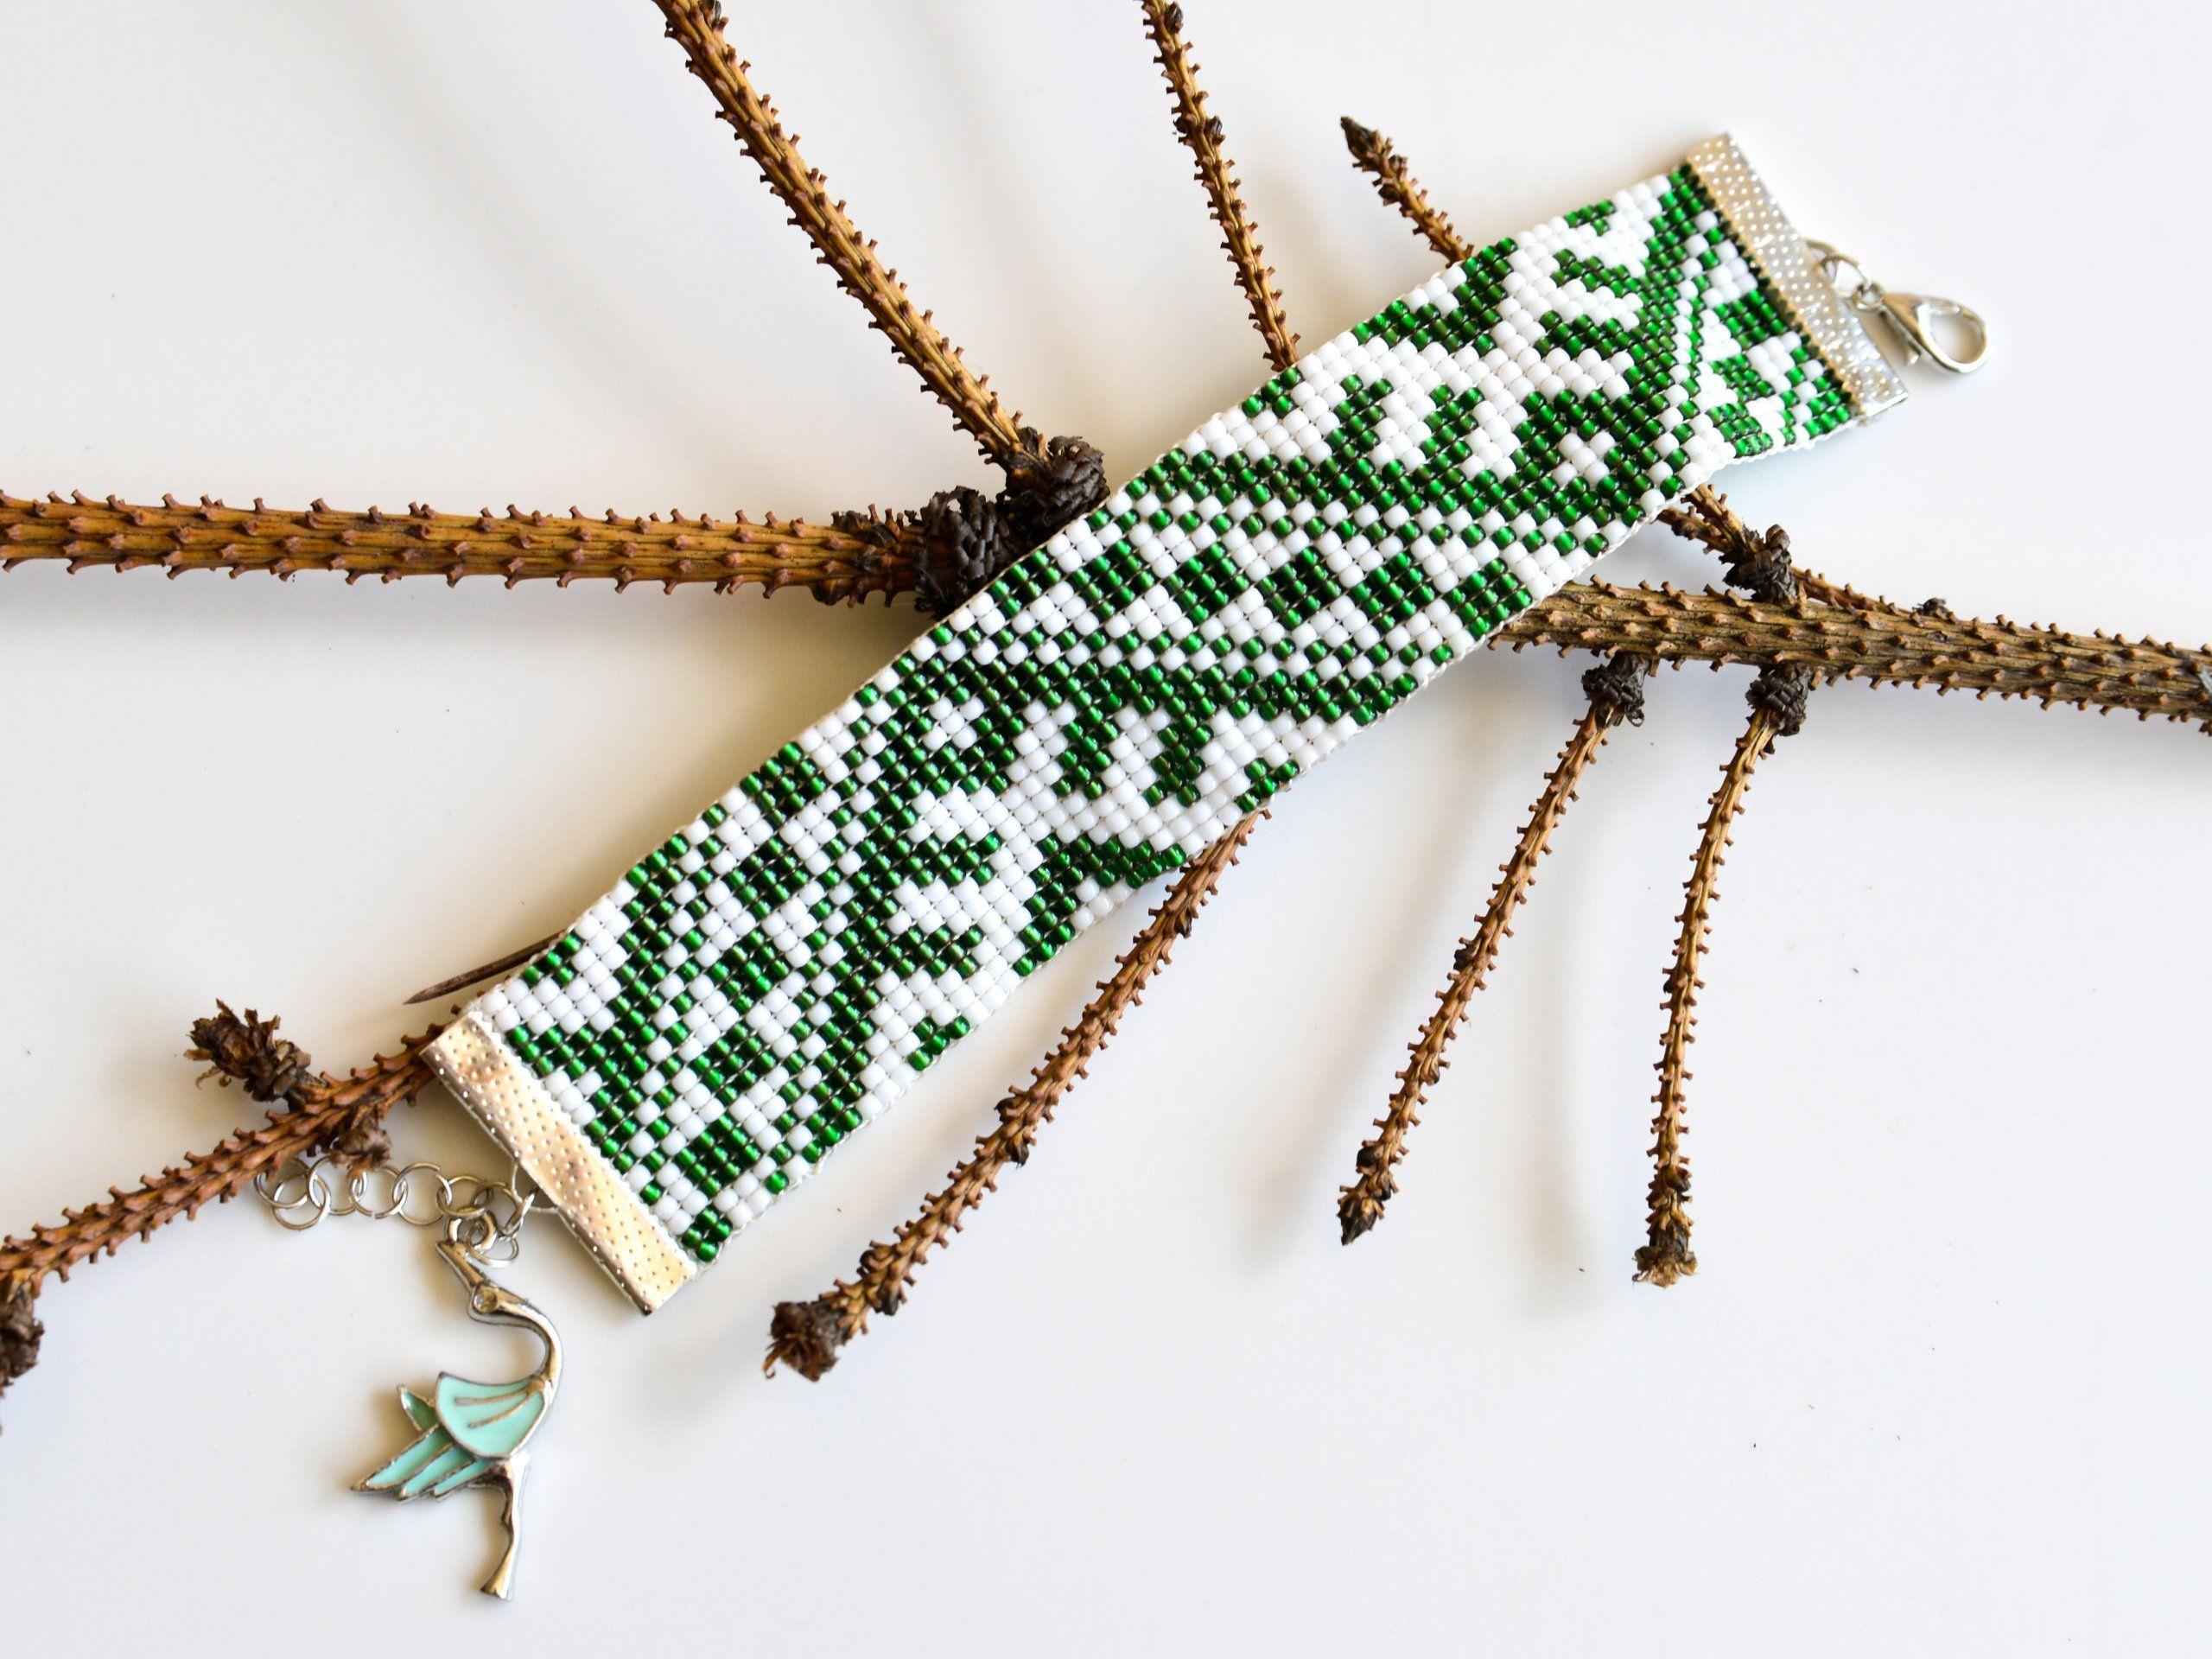 Bransoletka Zielona Biala Boho Etno Prezent 7338889243 Oficjalne Archiwum Allegro Green Bead Embroidered Friendship Bracelet Friendship Bracelets